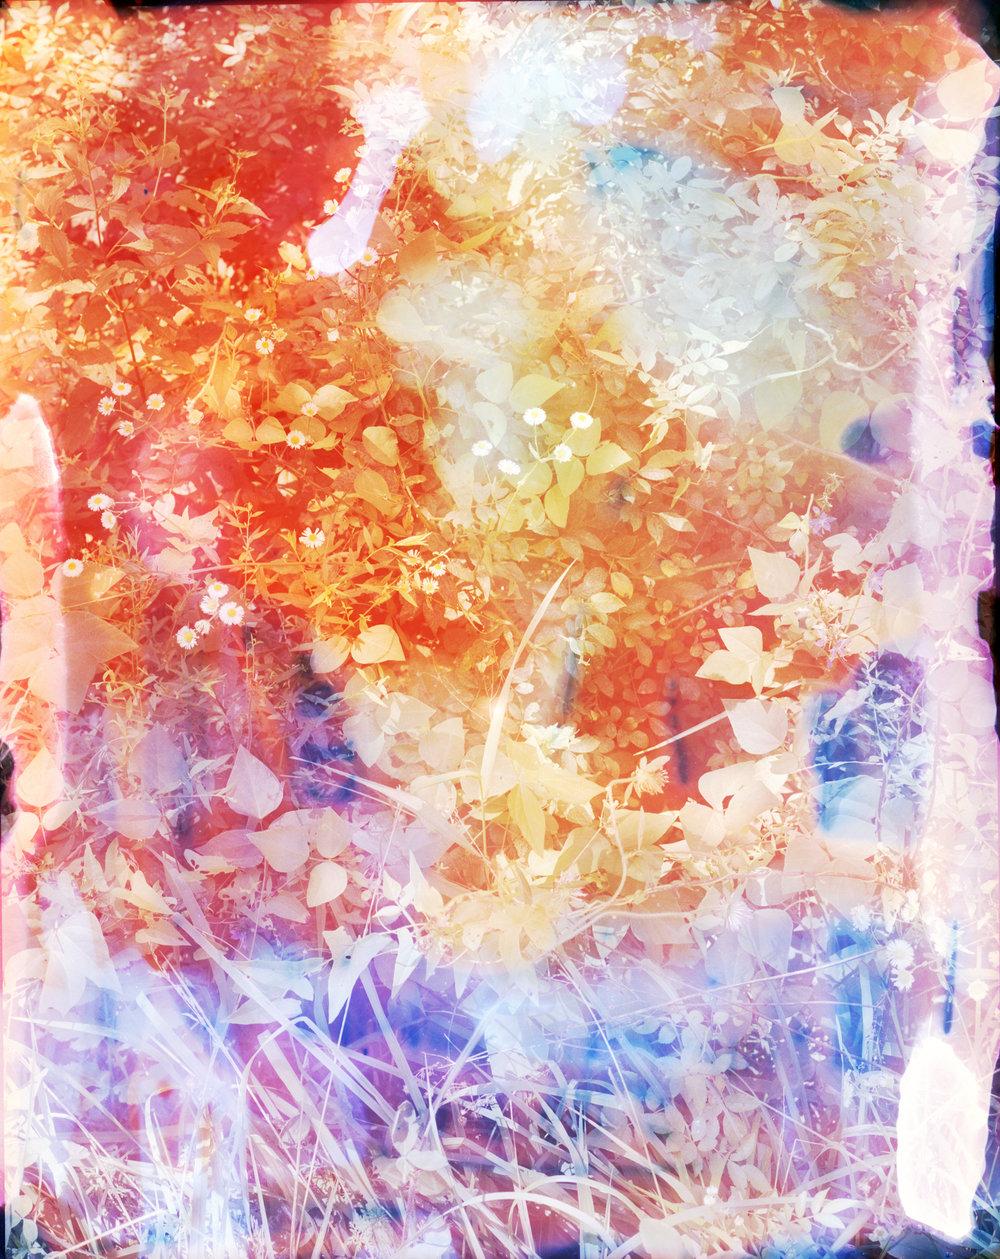 Reenactment 209 (Lavender Spray), 50 x 40 in, 2015